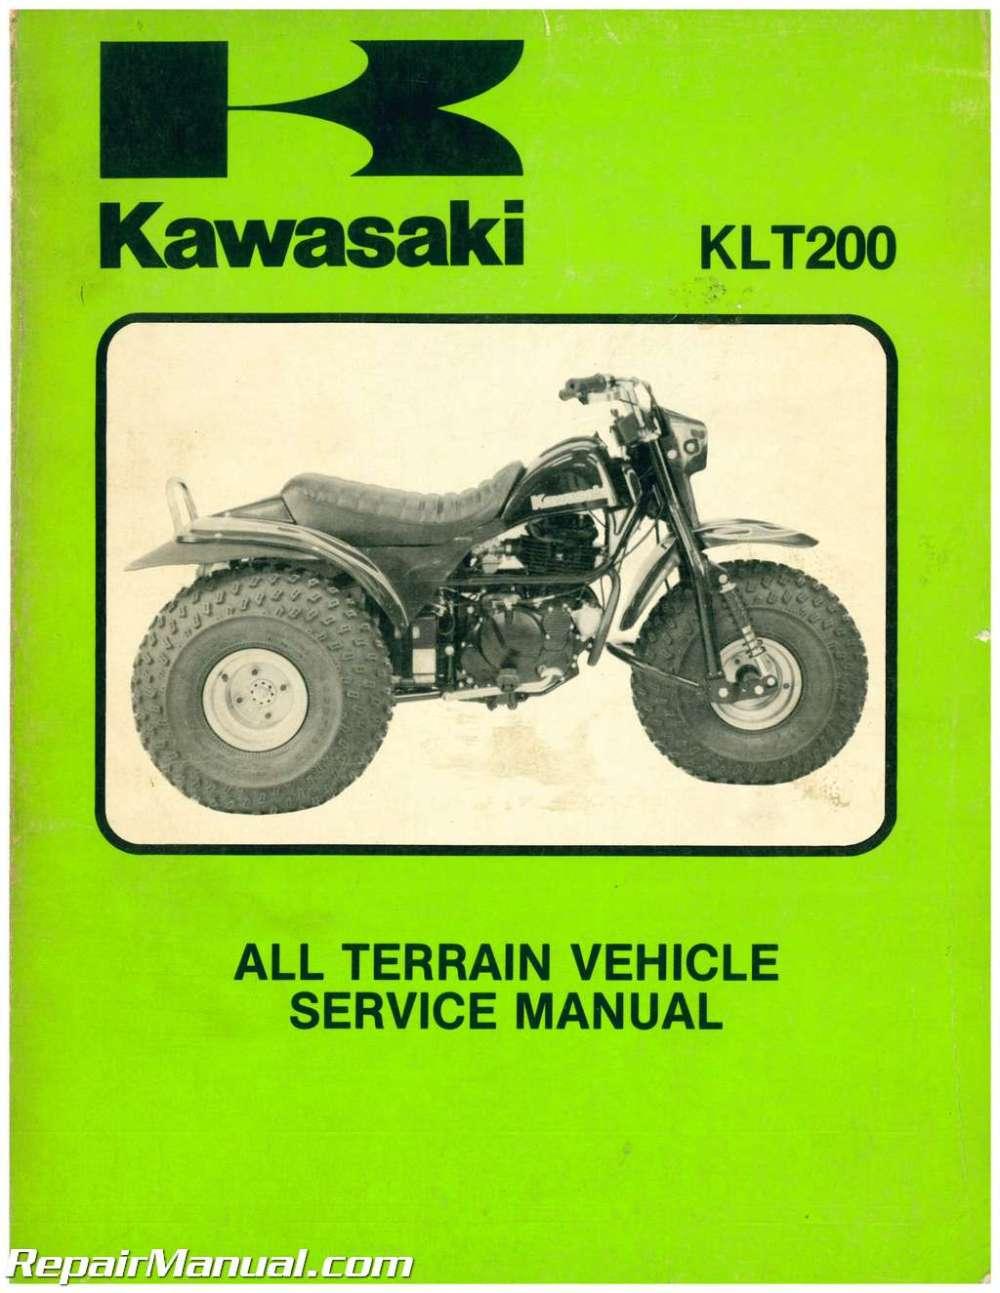 medium resolution of 1983 kawasaki klt200 atc three wheeler service manual